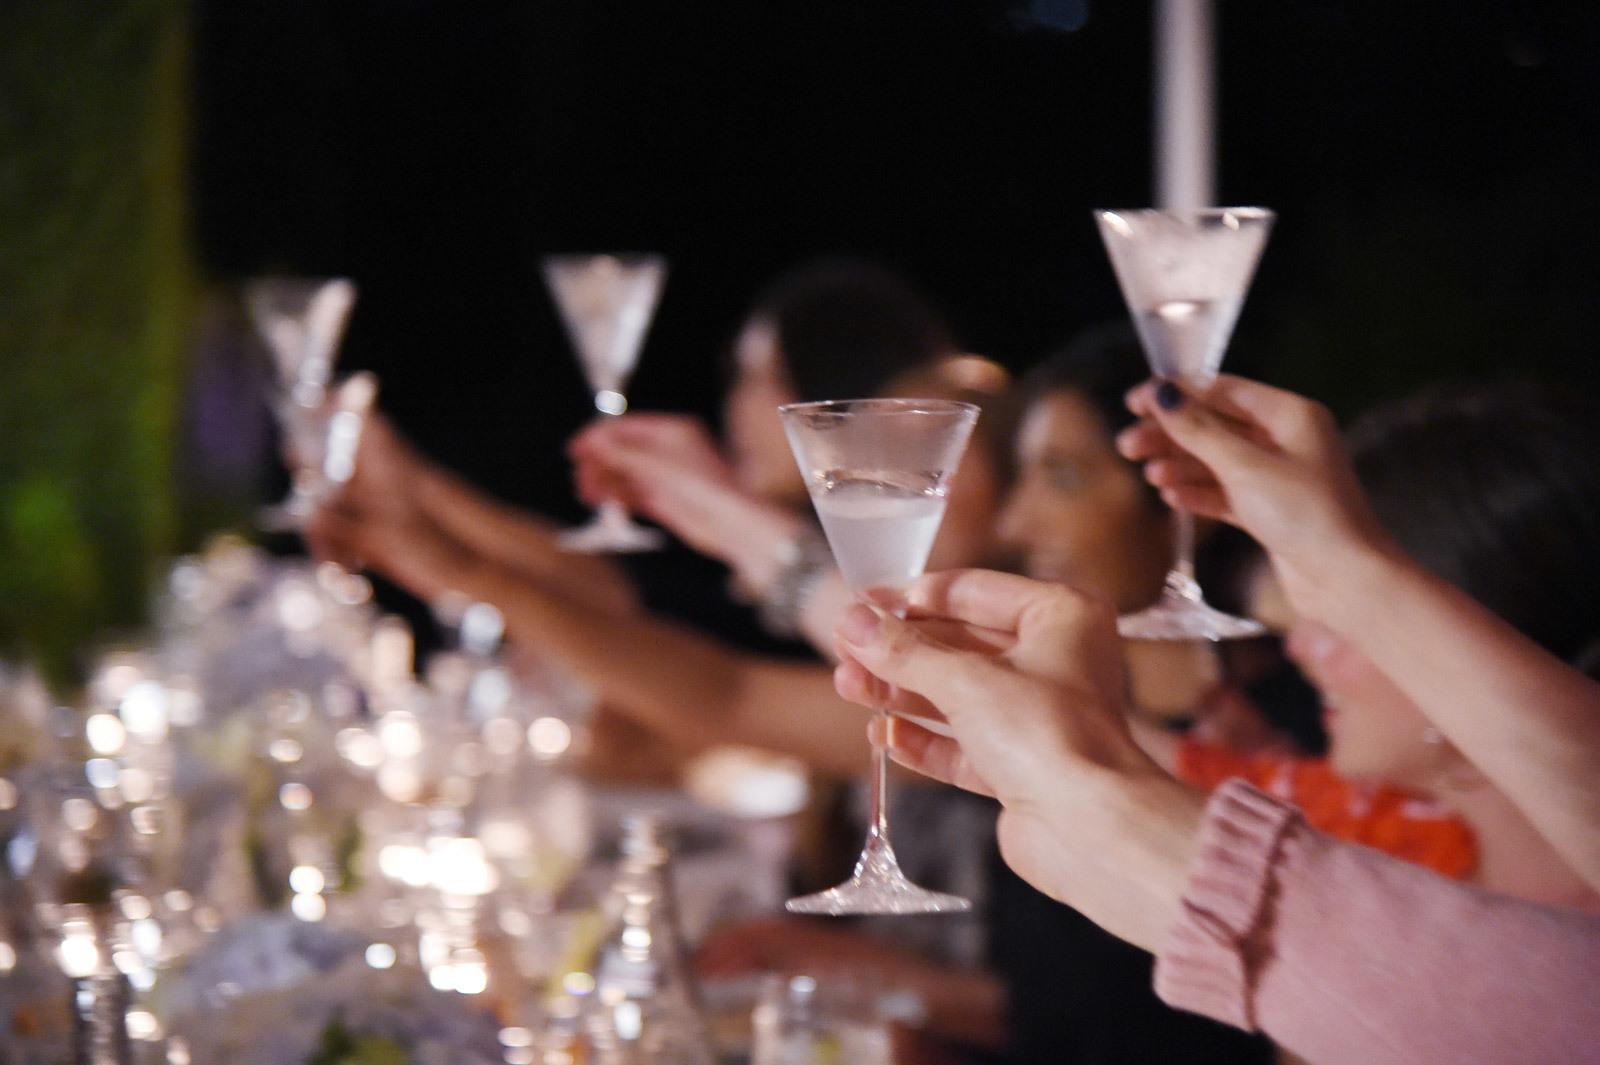 Le Fizz Cocktails At The Cannes Film Festival photo